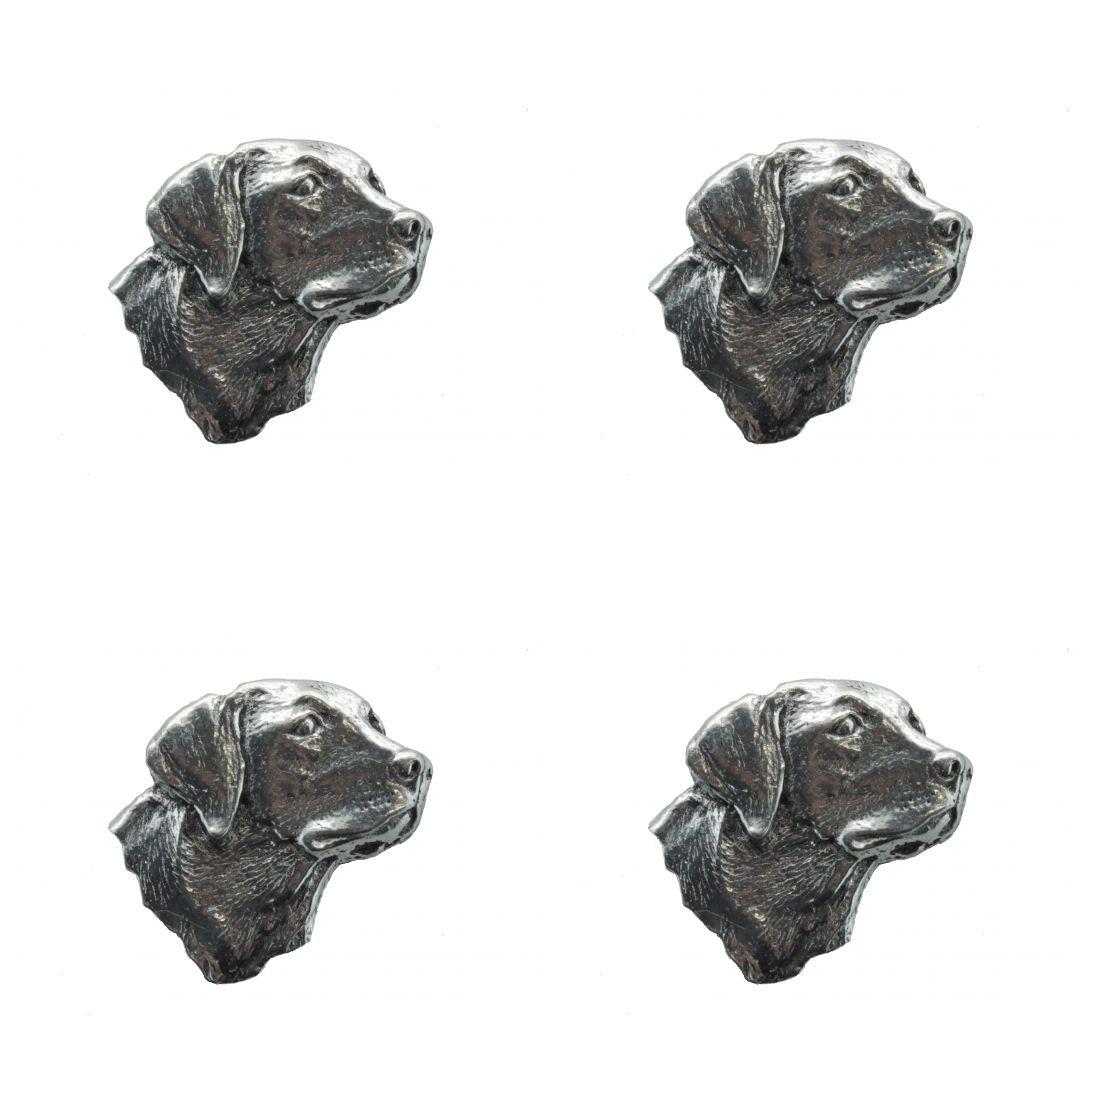 4x Pin Anstecker Badge Kopf Labrador, 2,8x2,3cm